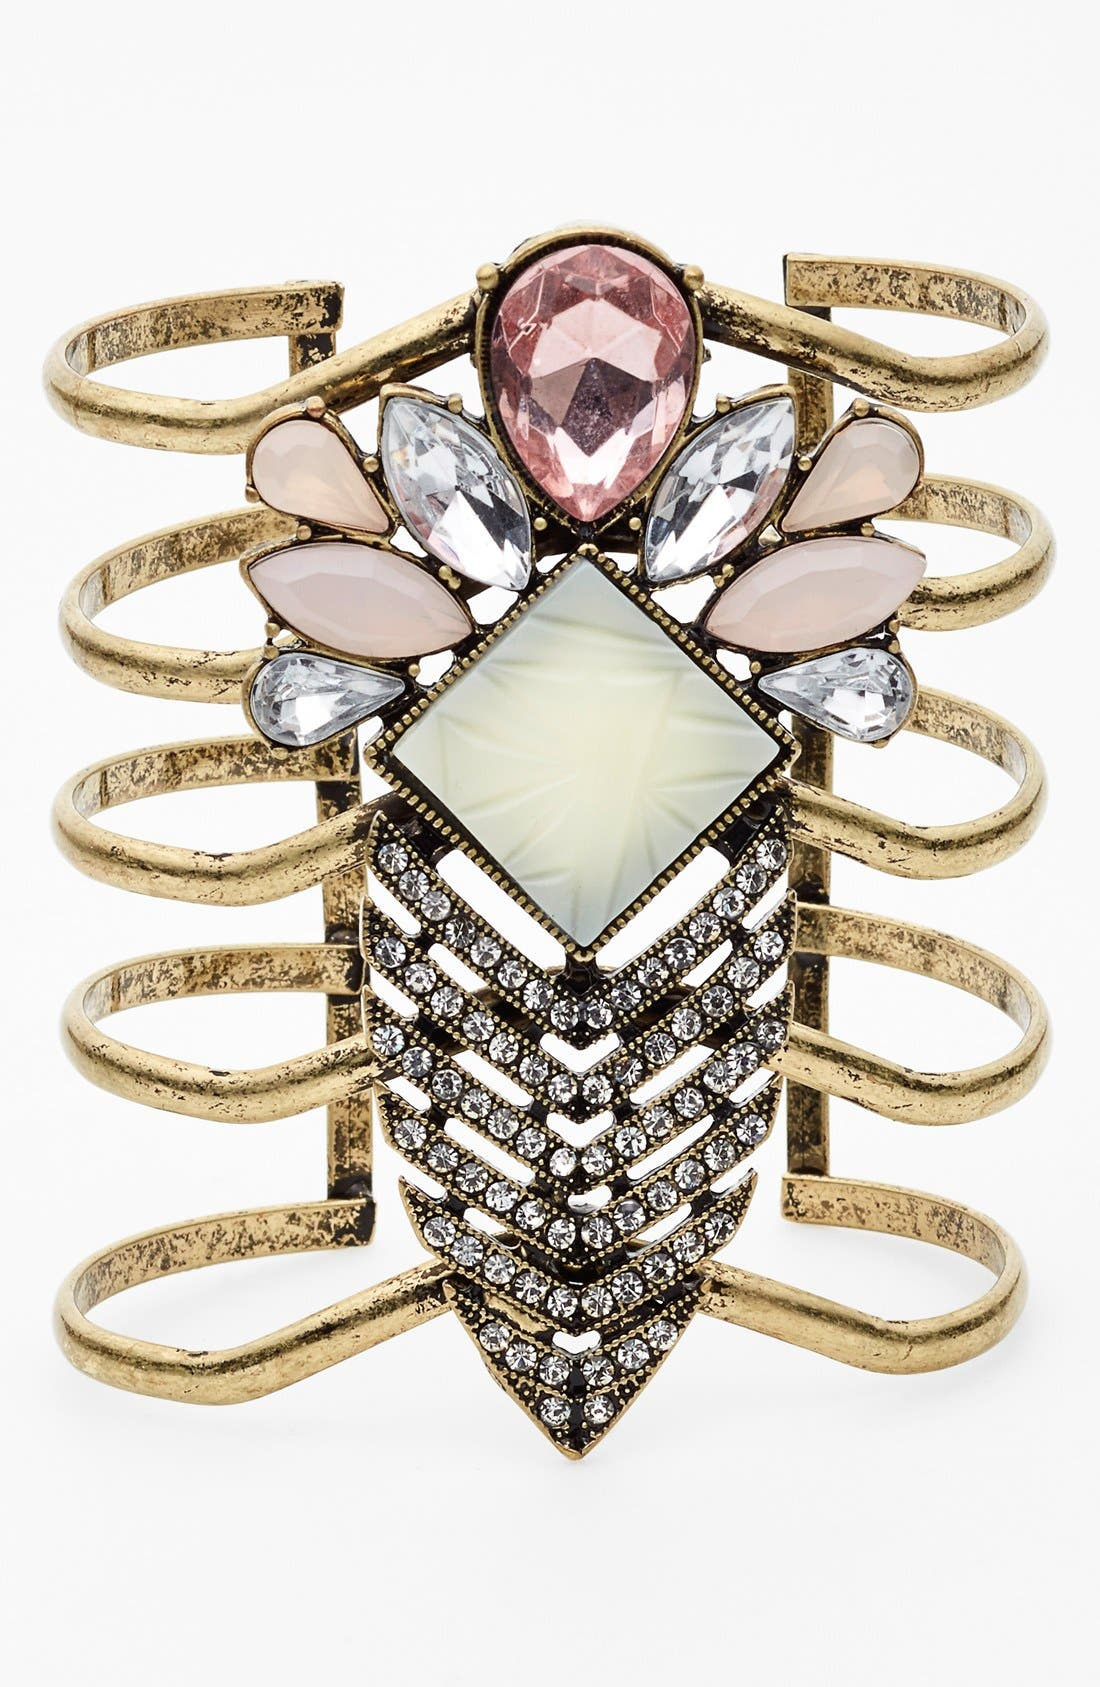 Main Image - Tildon Jewel Stone Statement Cuff